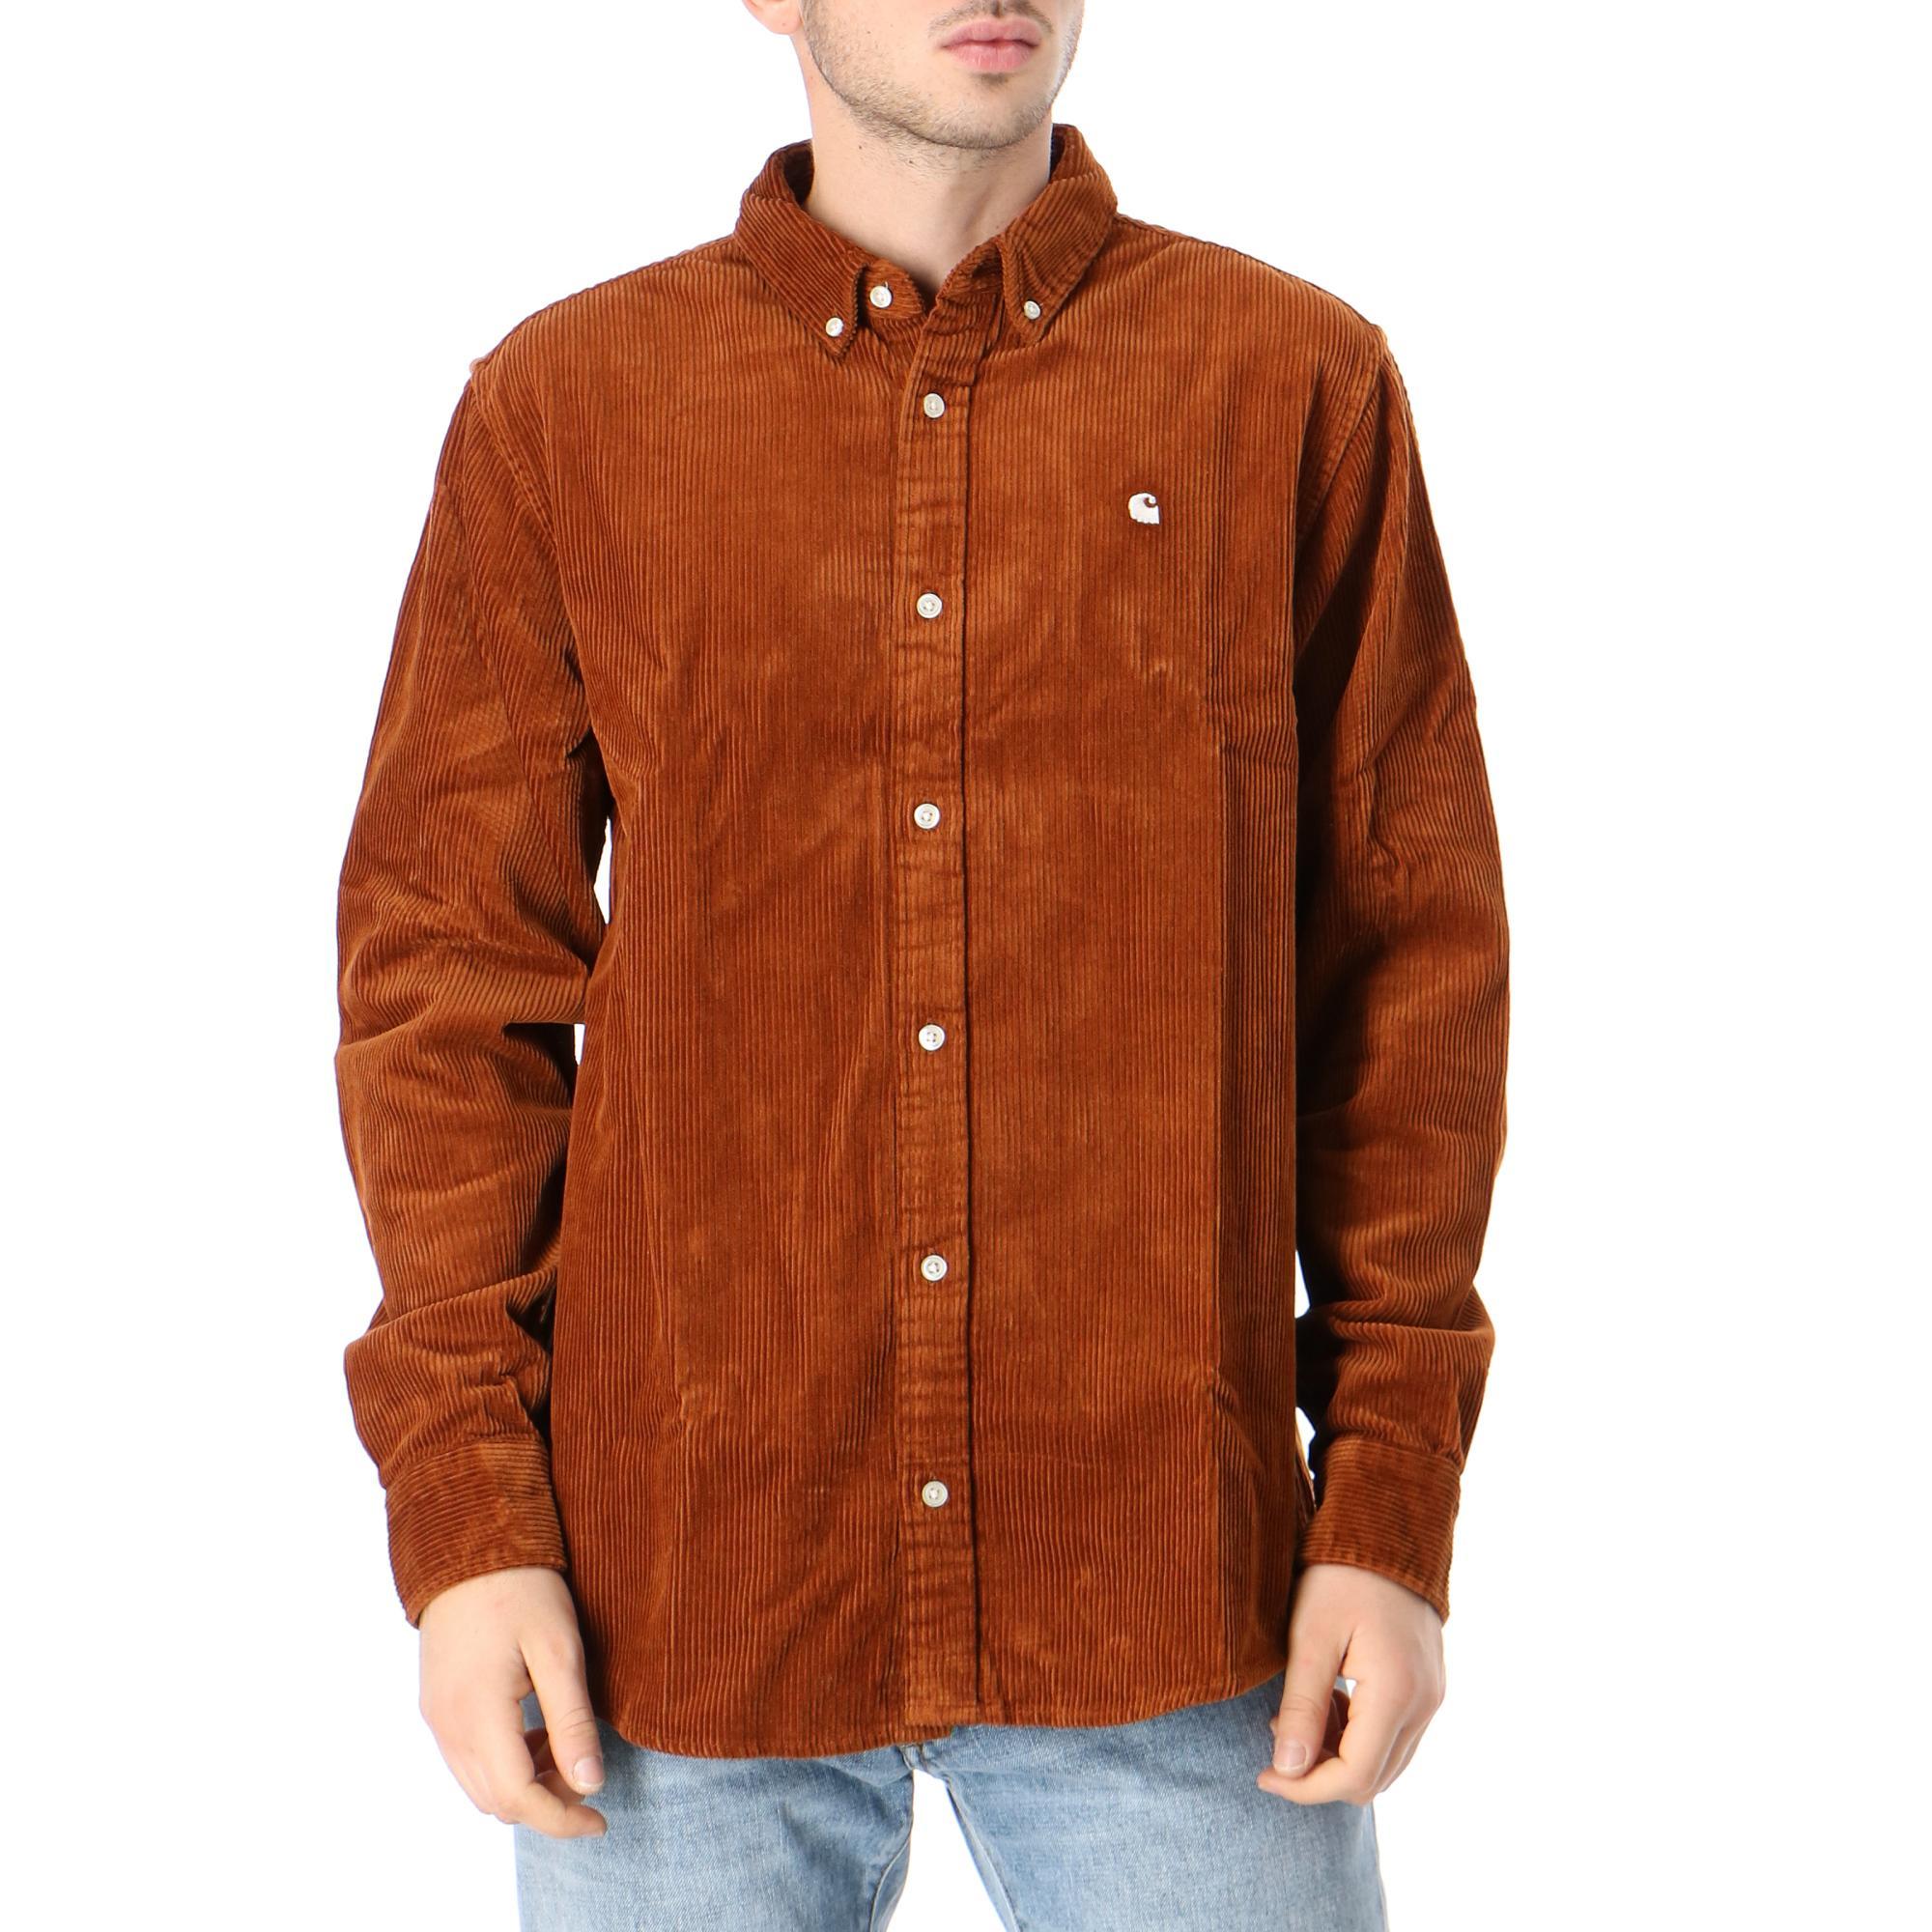 Carhartt L/s Madison Cord Shirt Brandy wax